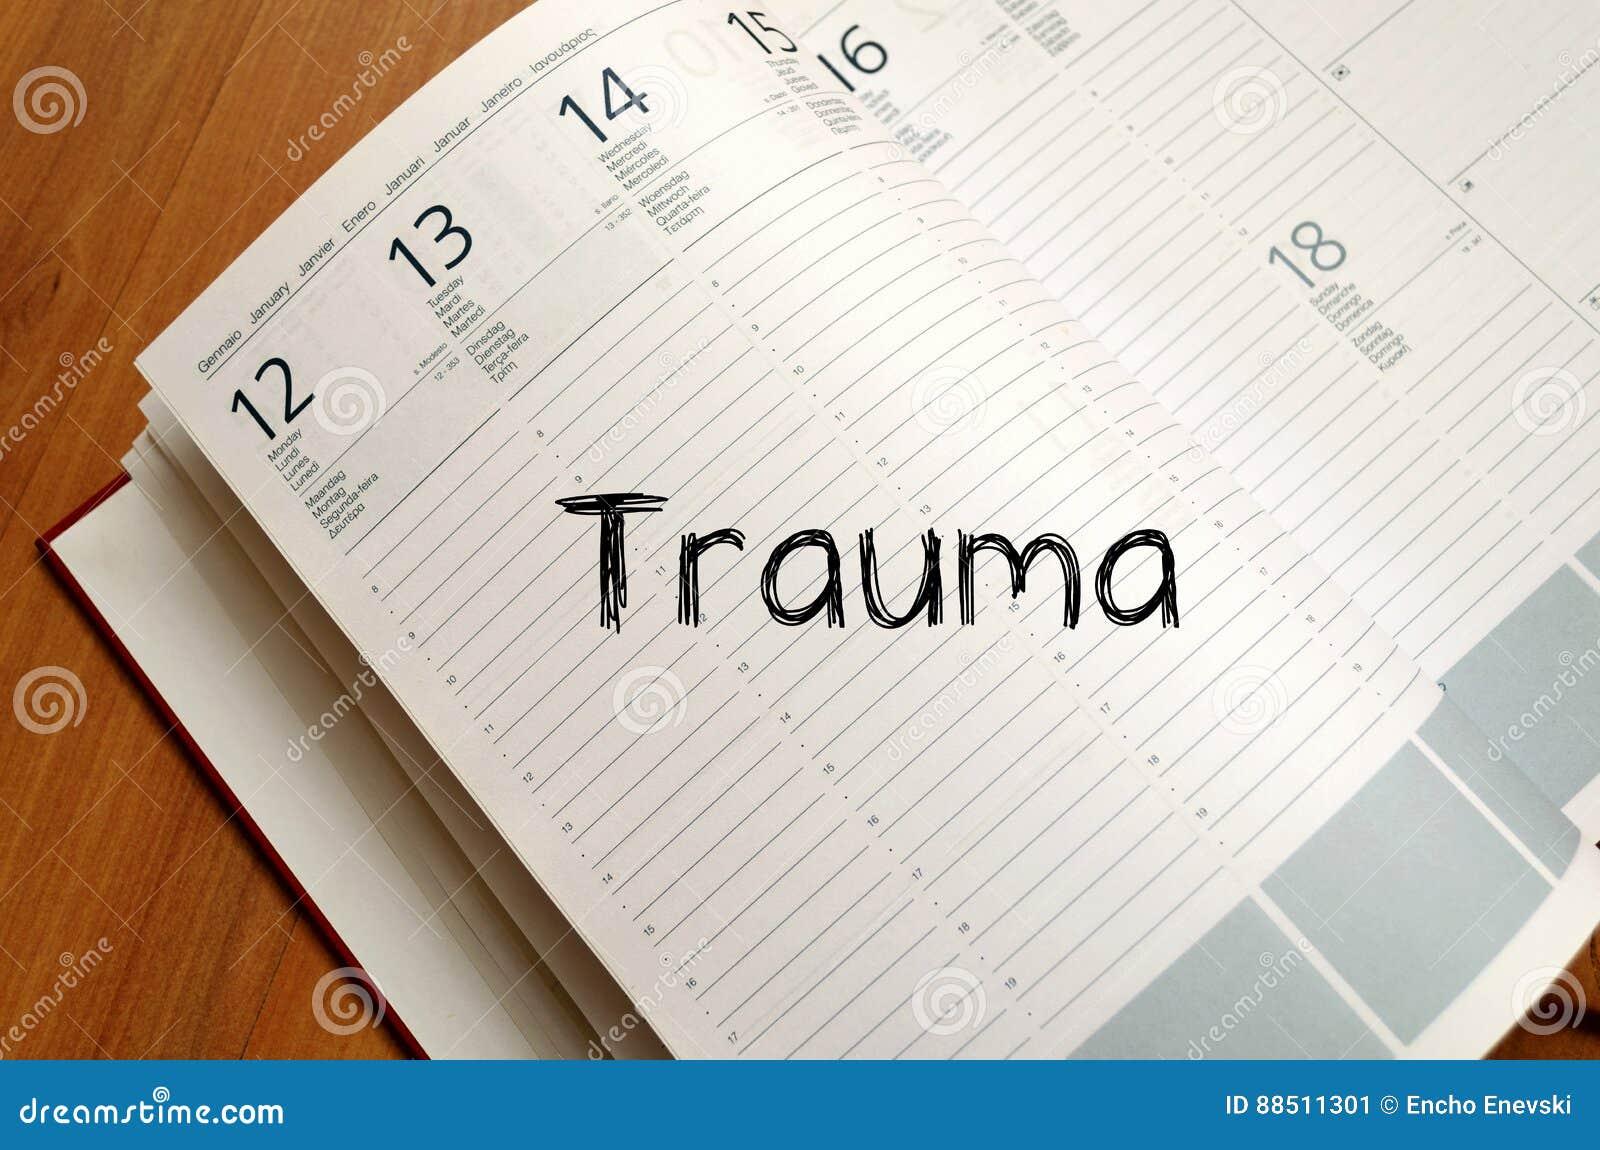 Trauma write on notebook